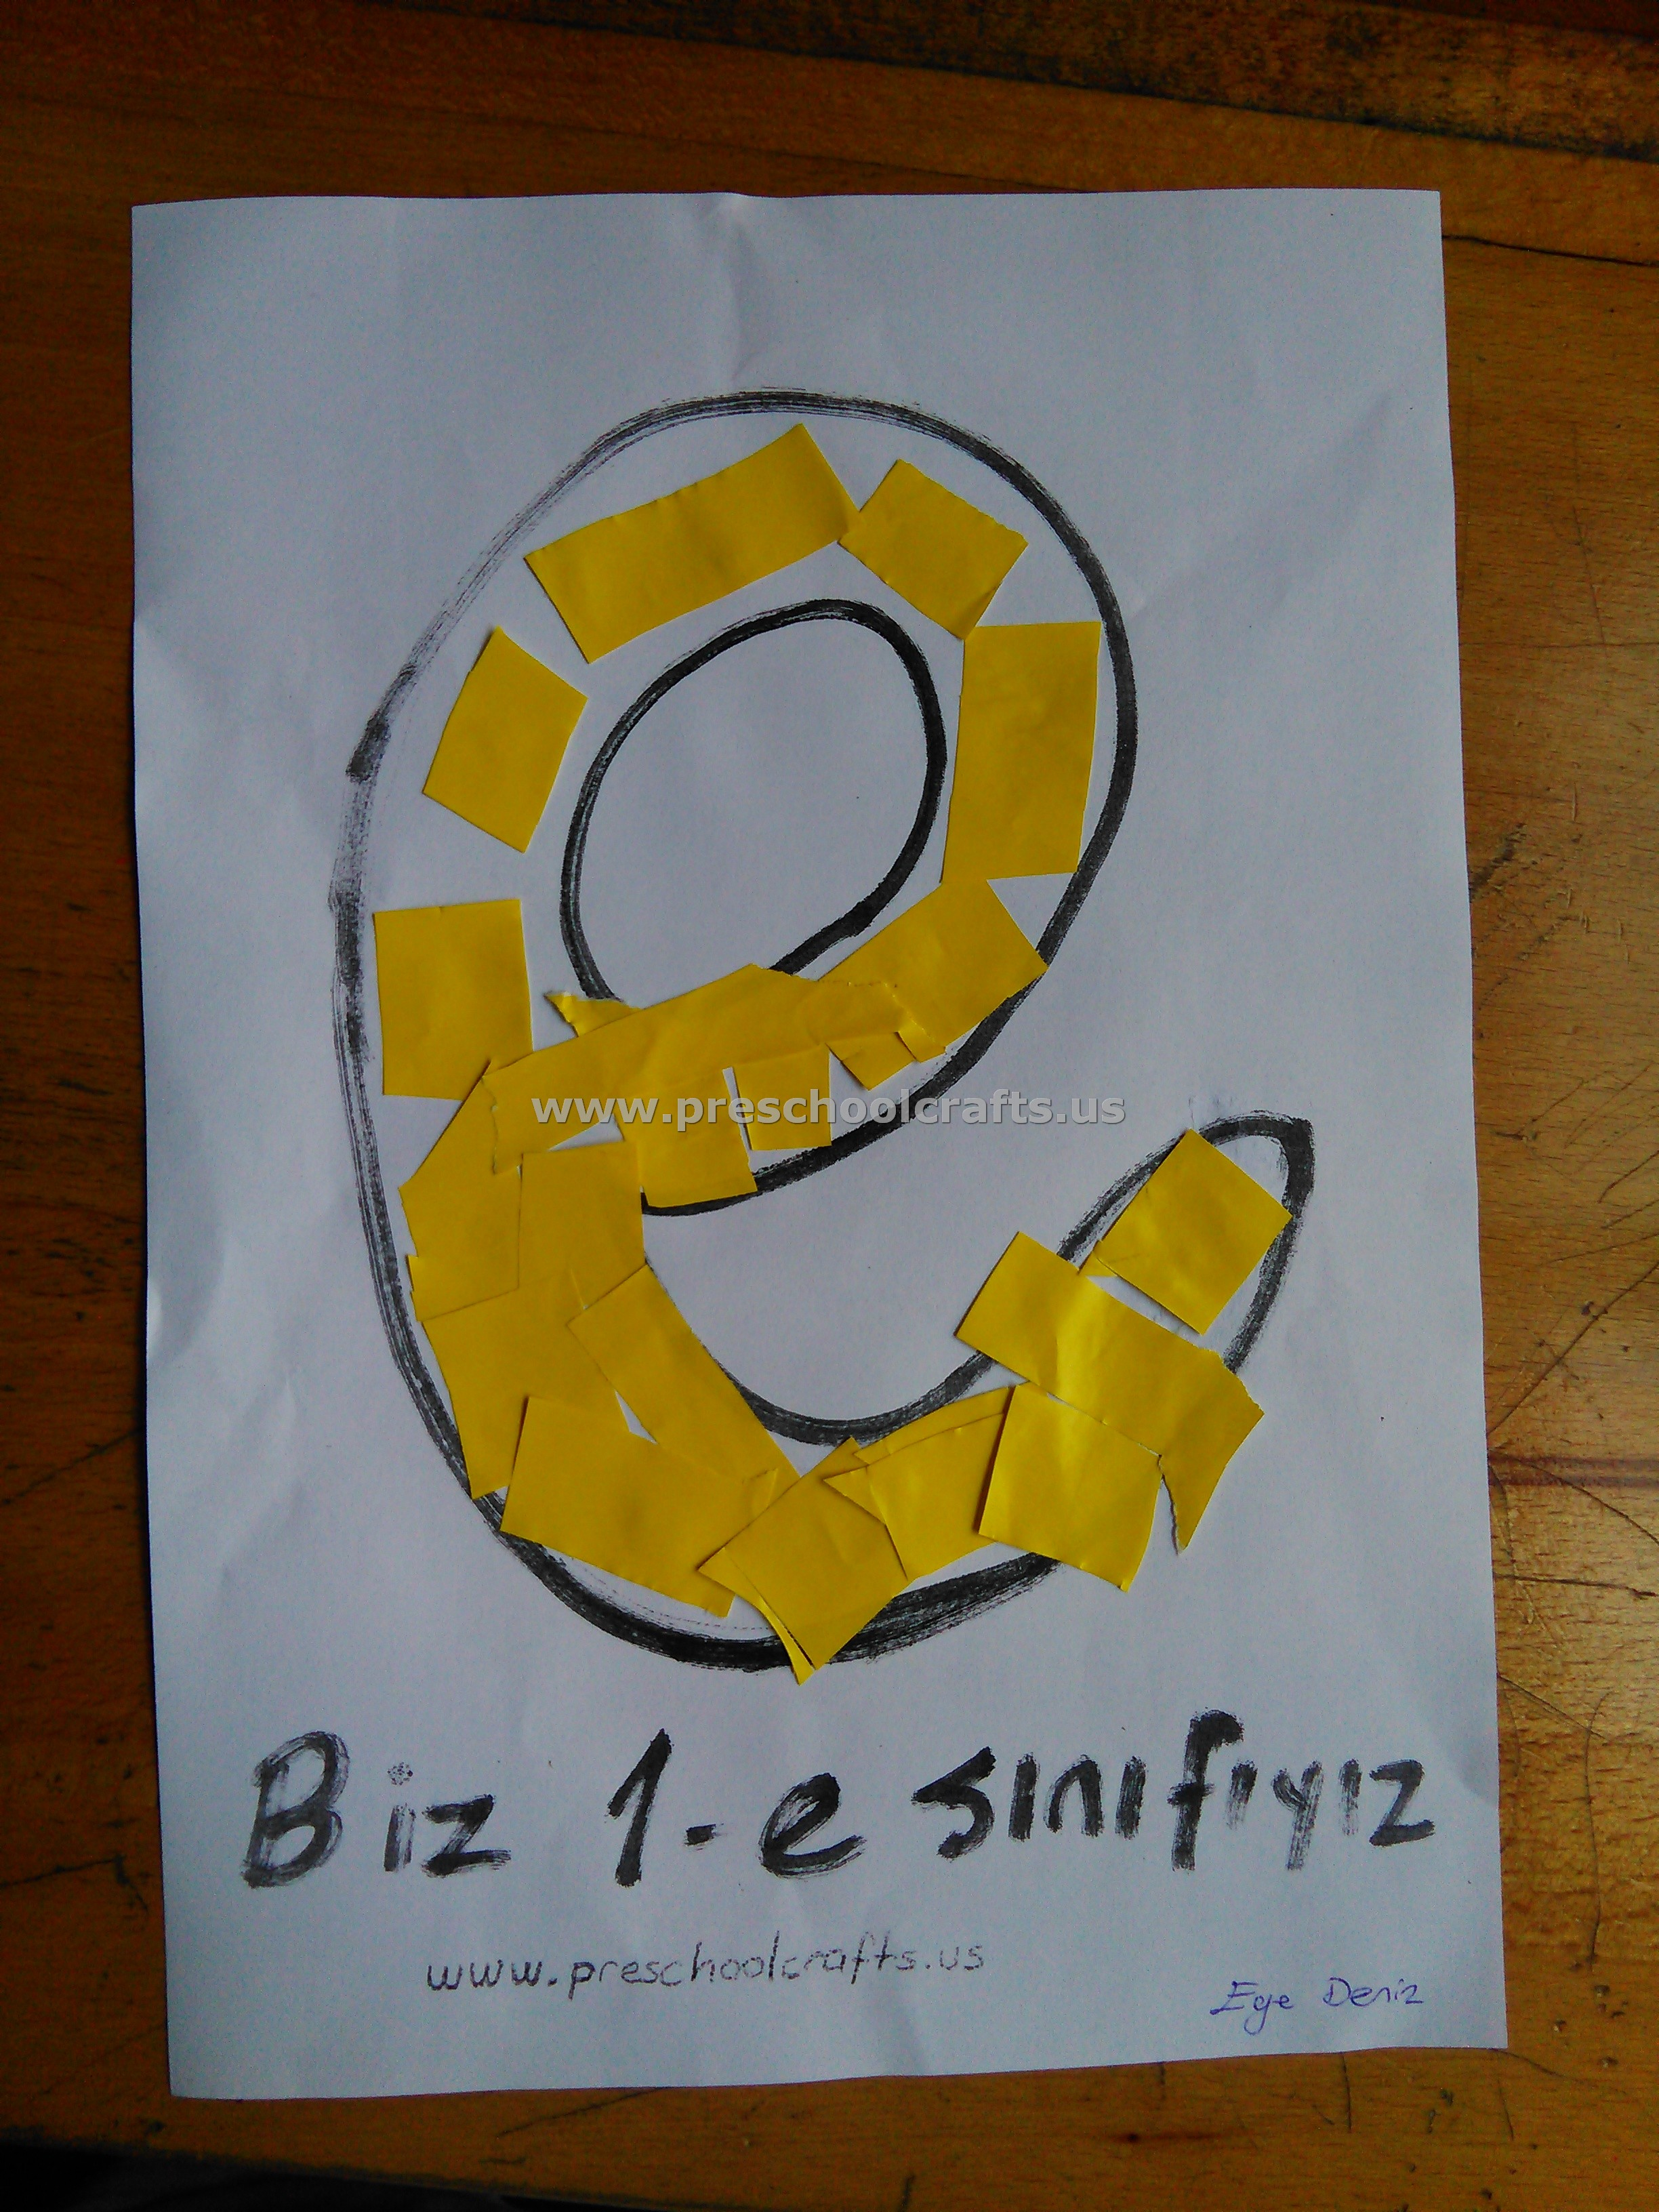 Letter e crafts ideas for kid preschool crafts for E crafts for preschoolers